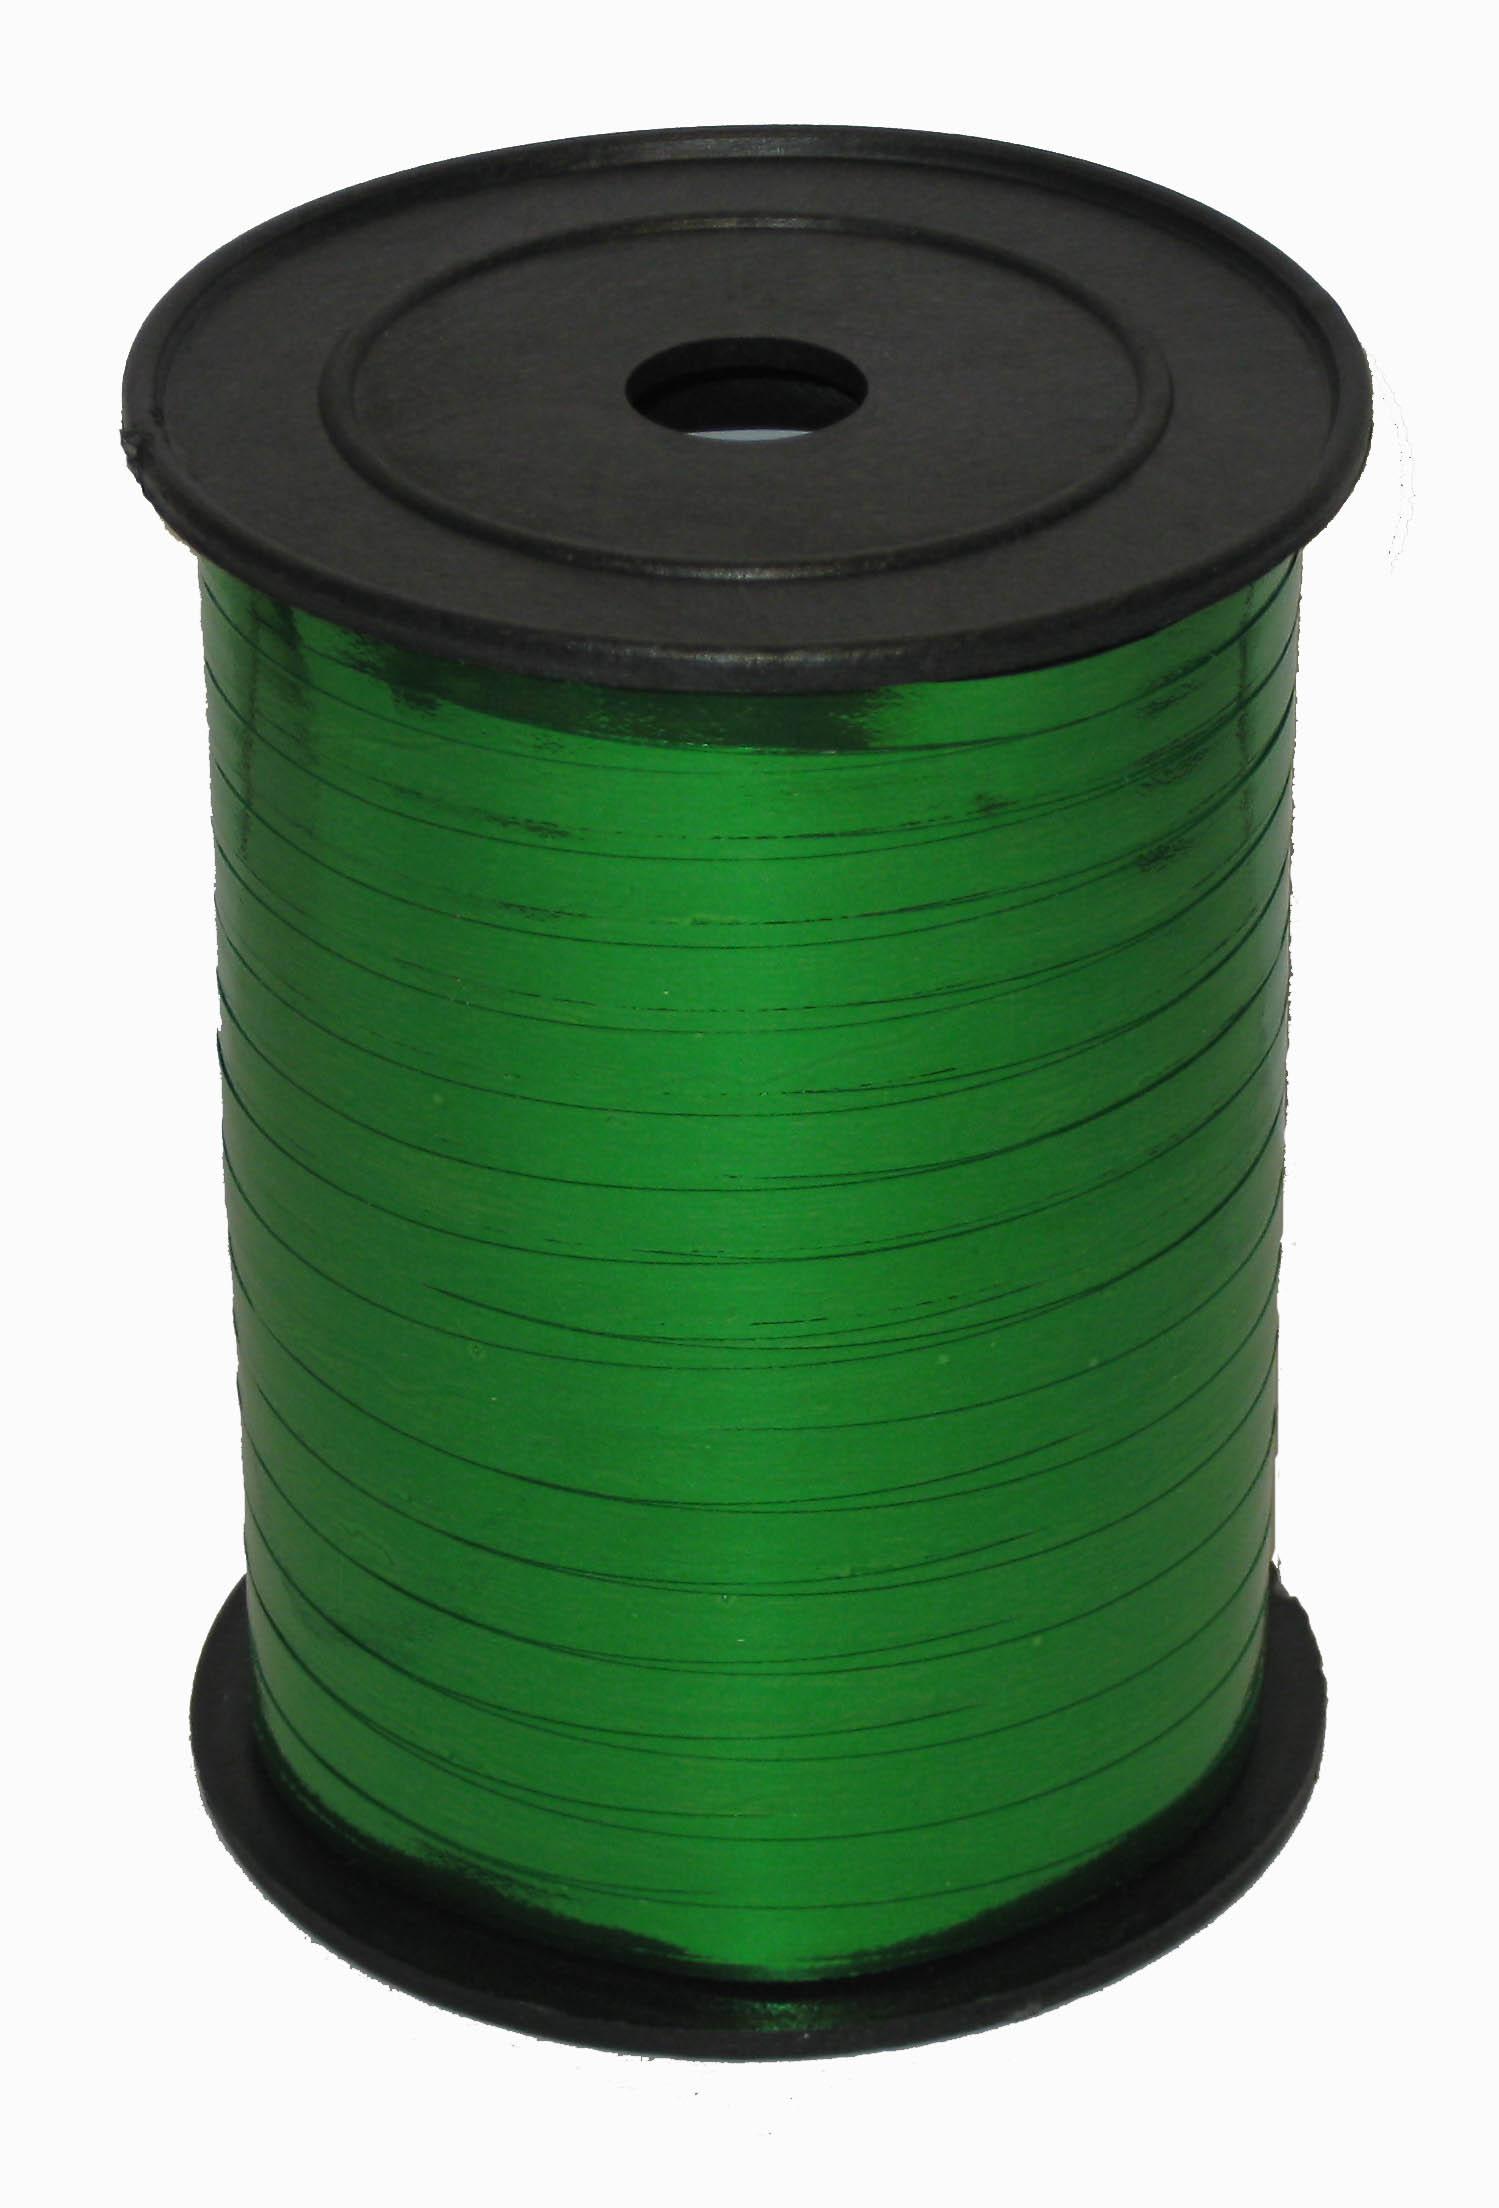 Лента Зеленая металл, бобина 0,5 см / 250 м / Россия